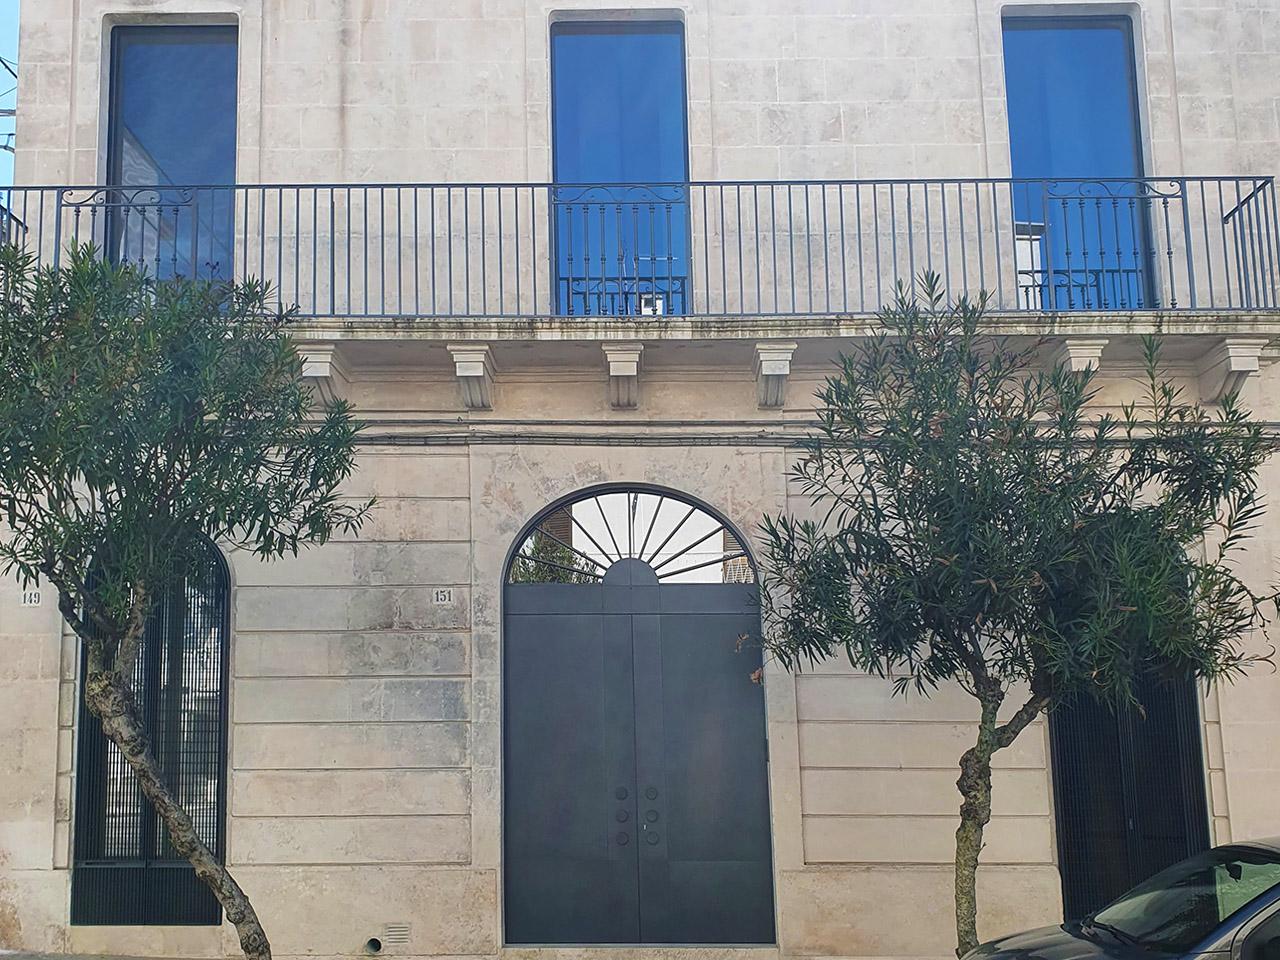 costruzioni restauri sirio ostuni ristrutturazione abitazione privata musa ostuni 20210314 115056